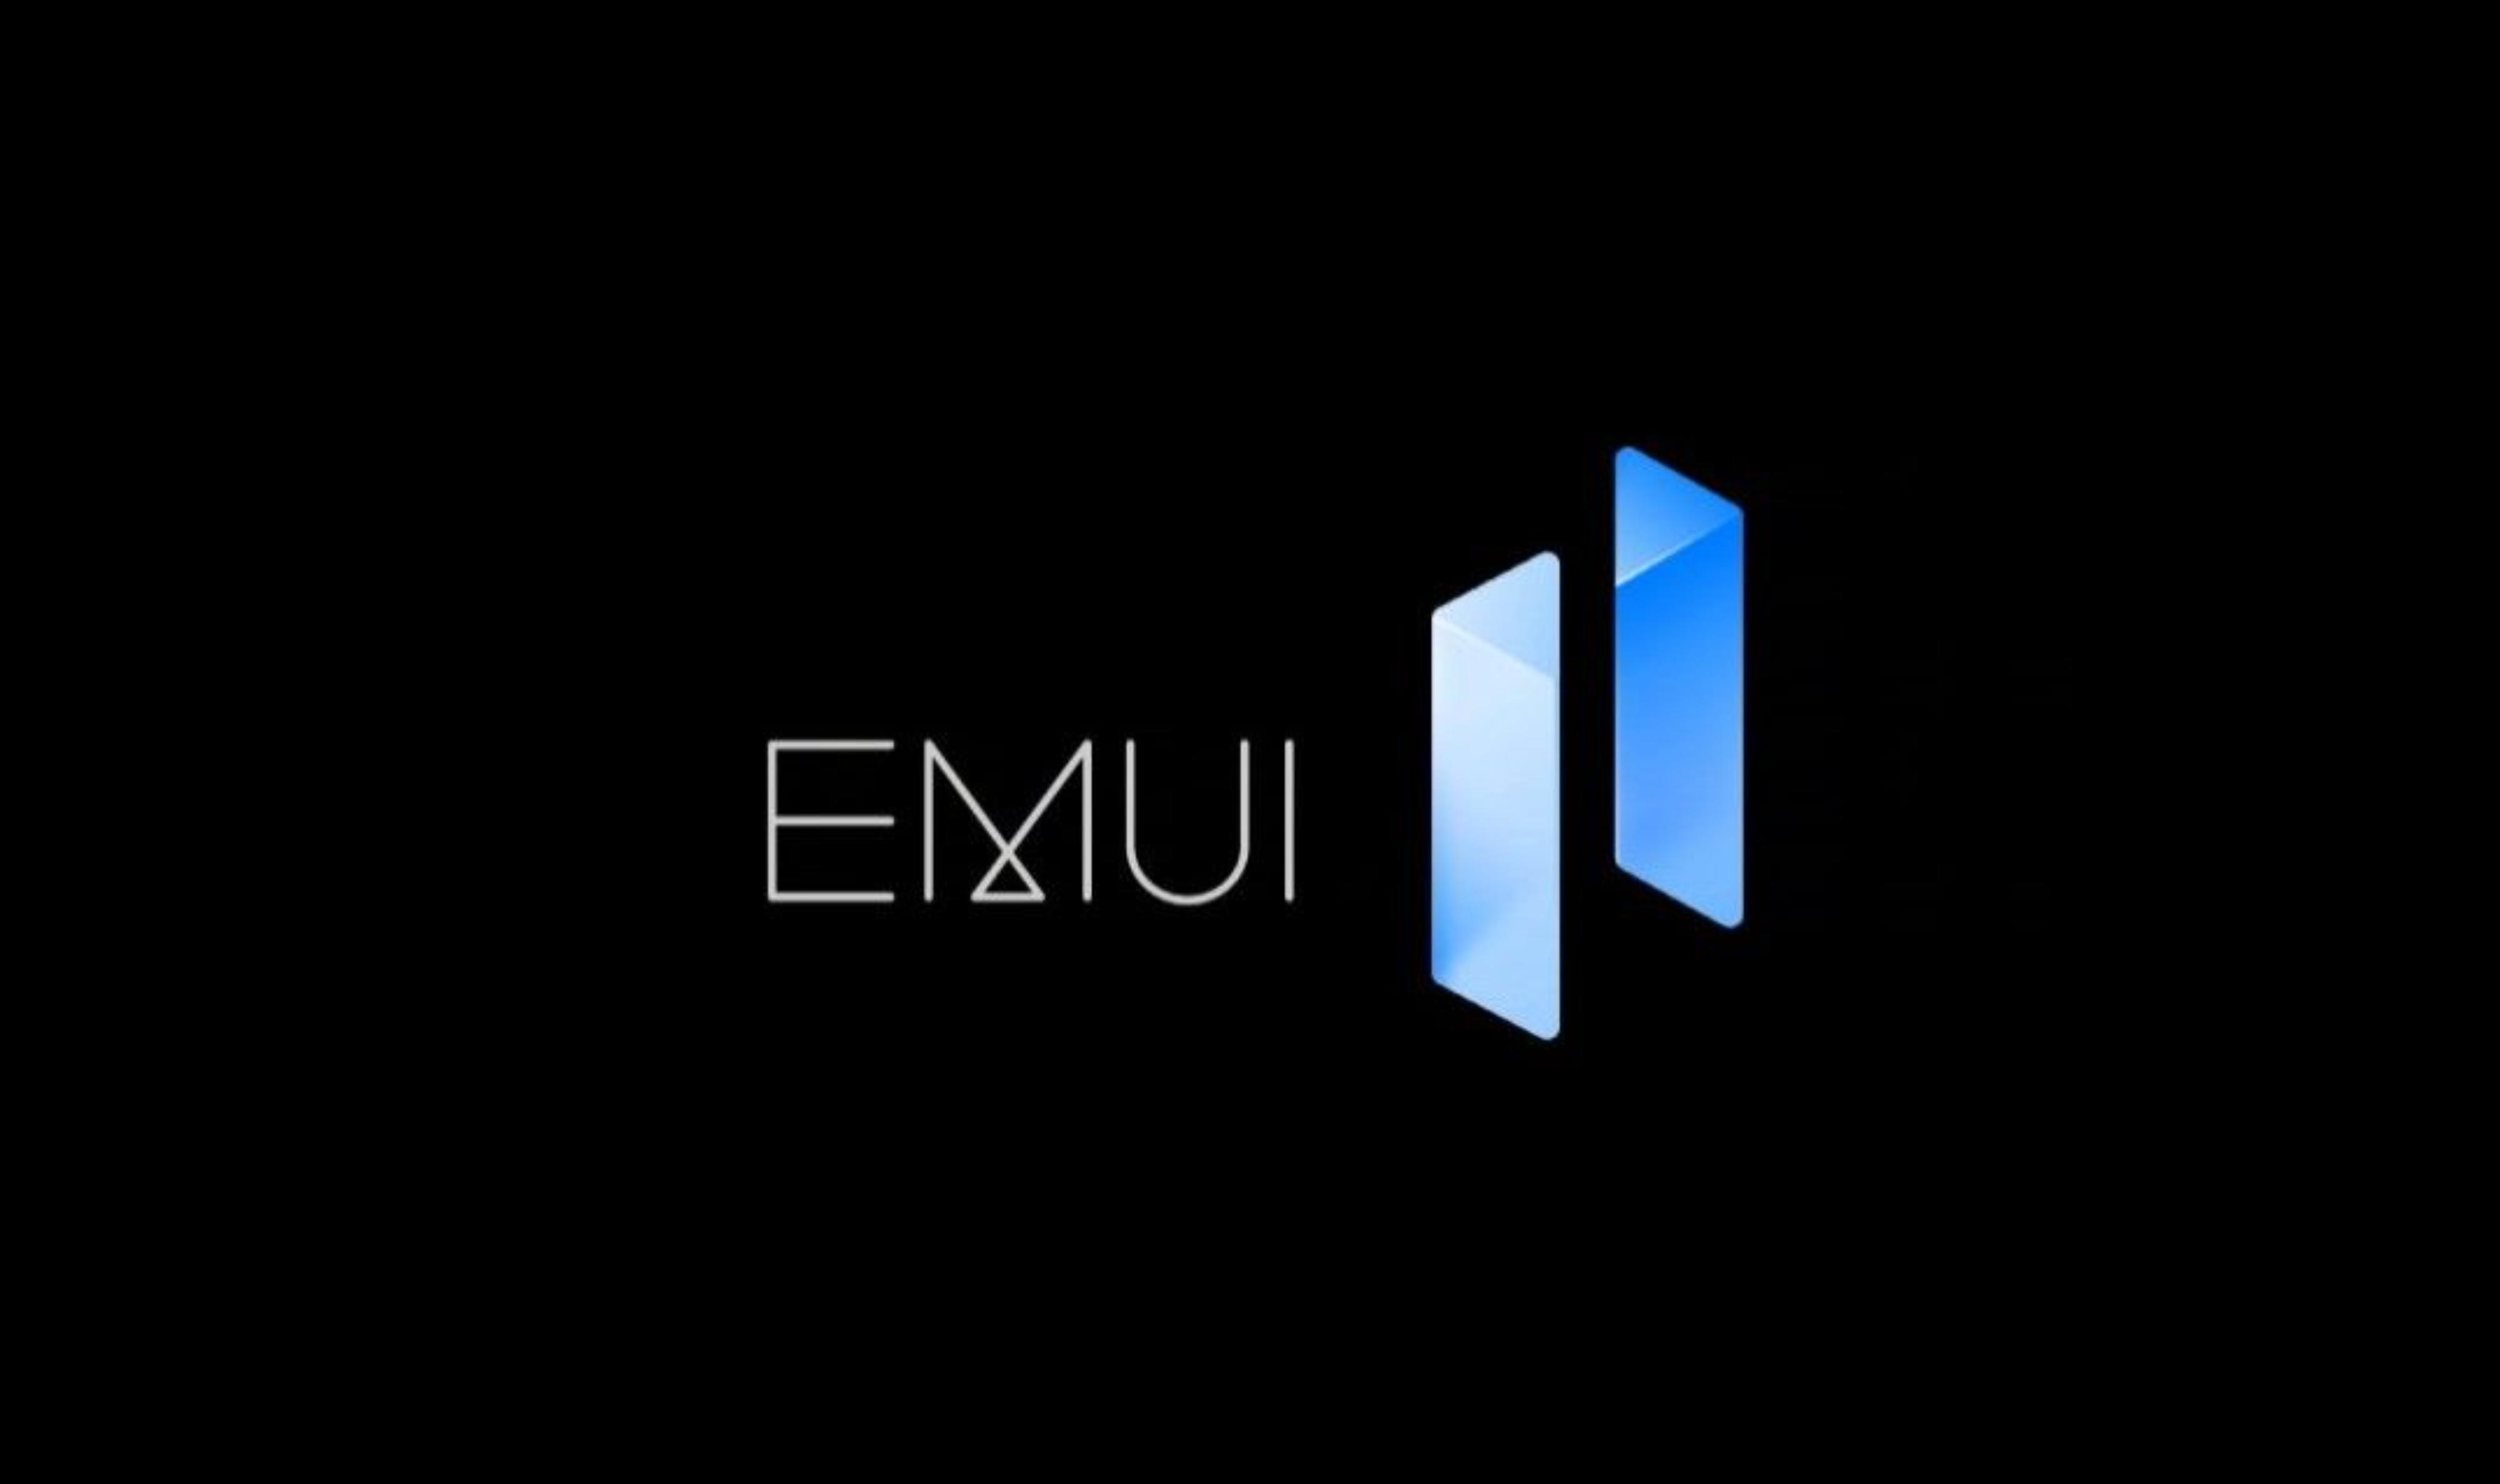 HUAWEI EMUI 11 Logo Hervorgehoben